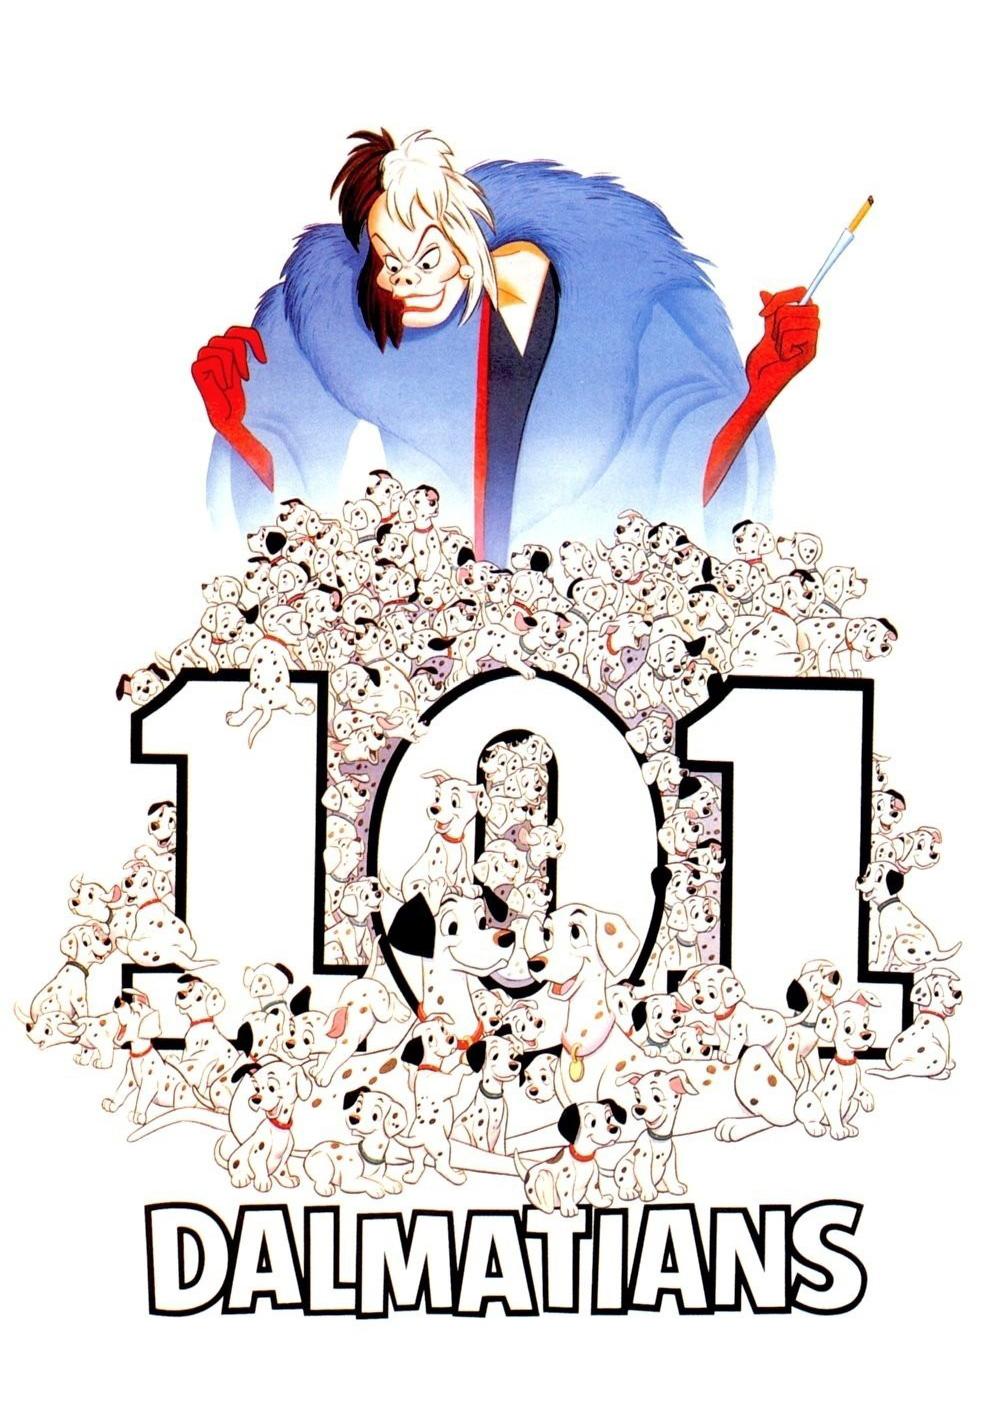 101 dalmatians full movie download in hindi